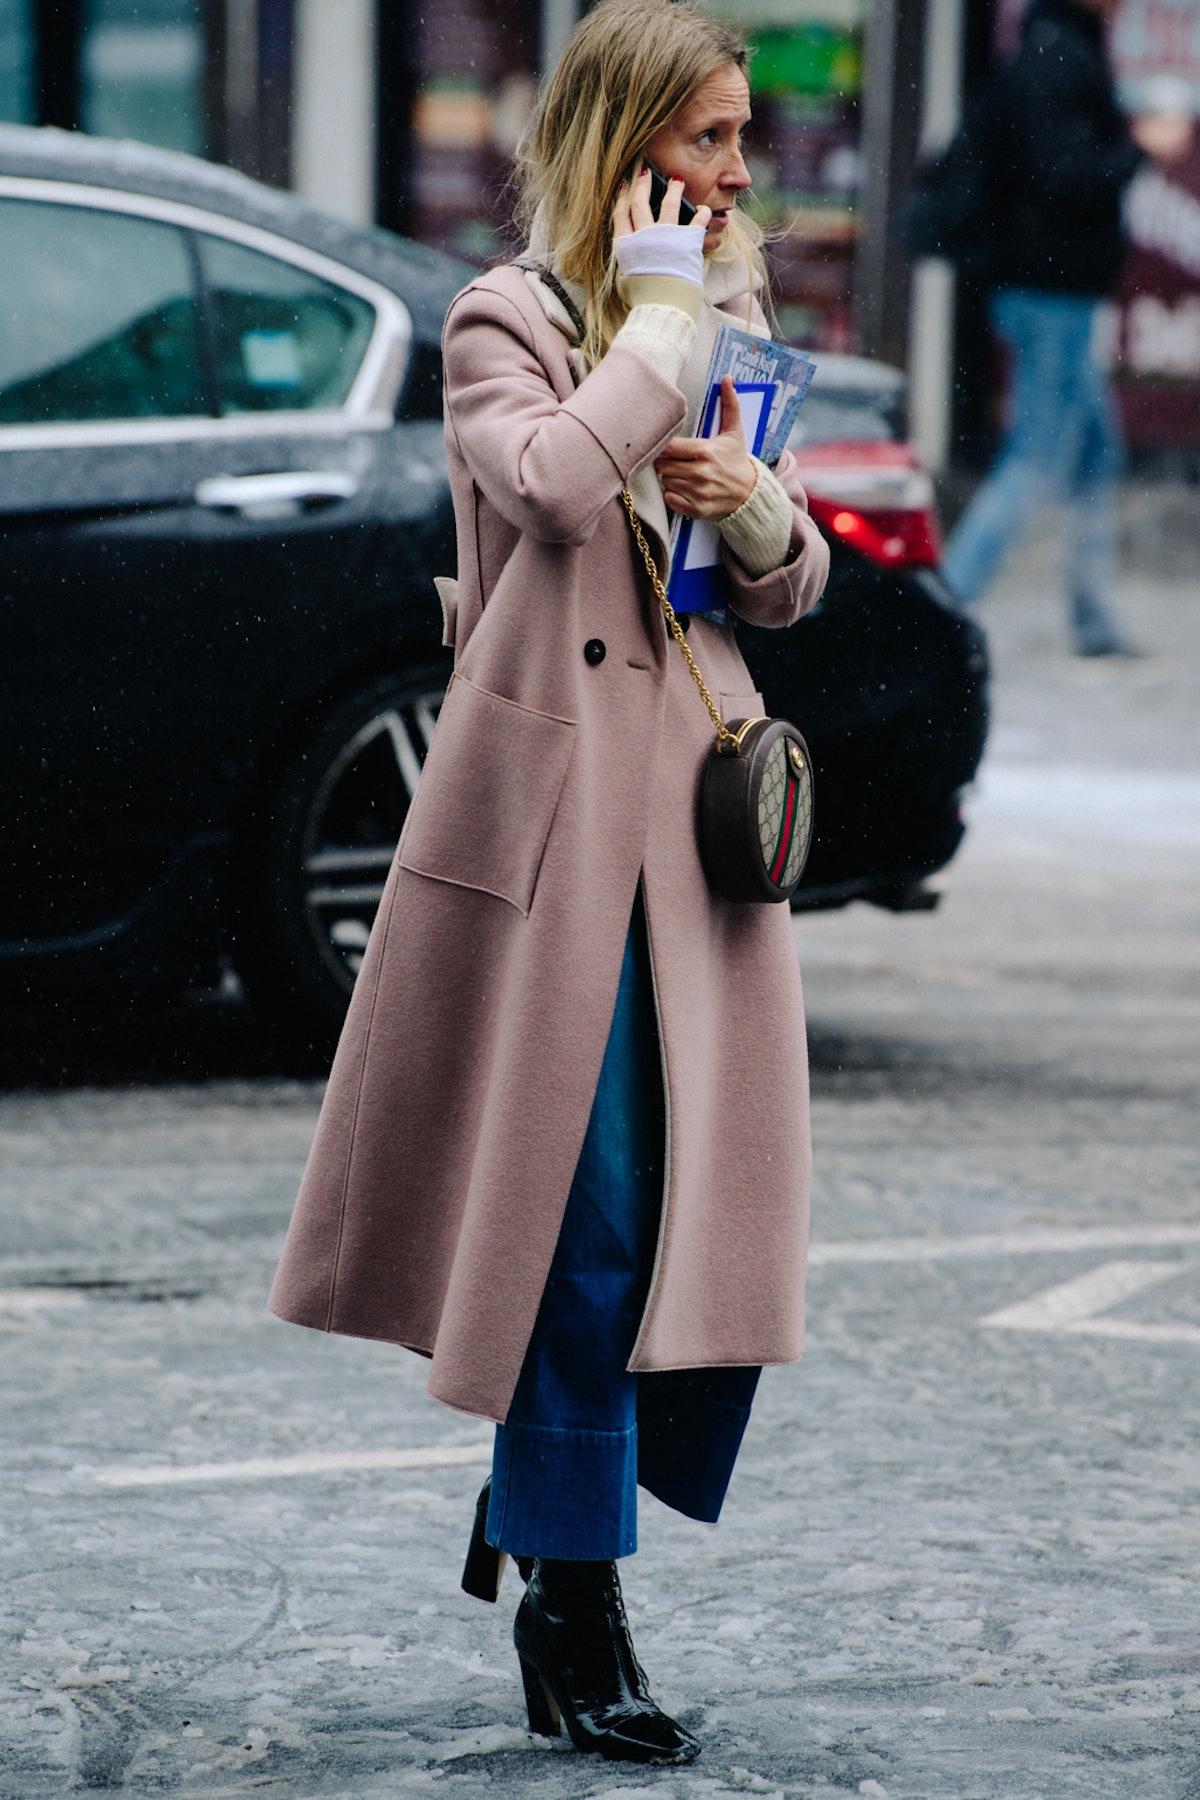 Adam-Katz-Sinding-W-Magazine-New-York-Fashion-Week-Fall-Winter-2019_AKS7788.jpg